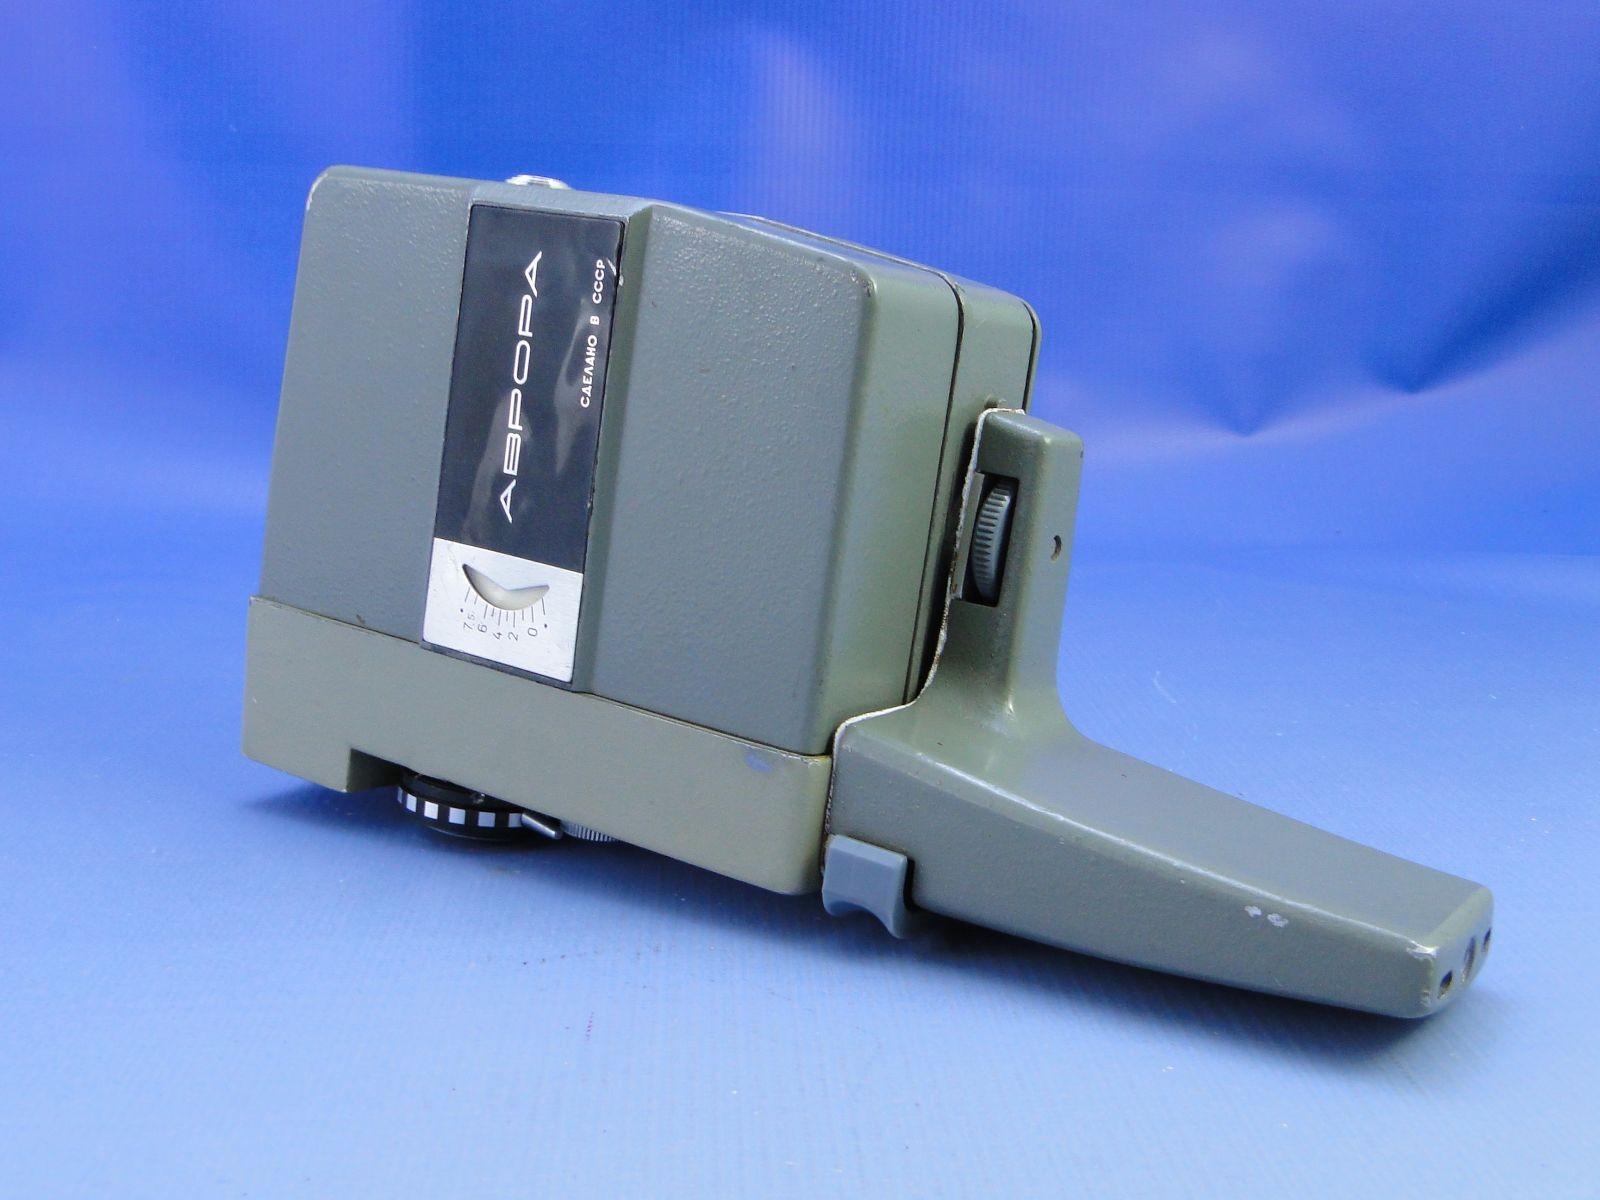 DSC07605.JPG (1600×1200)